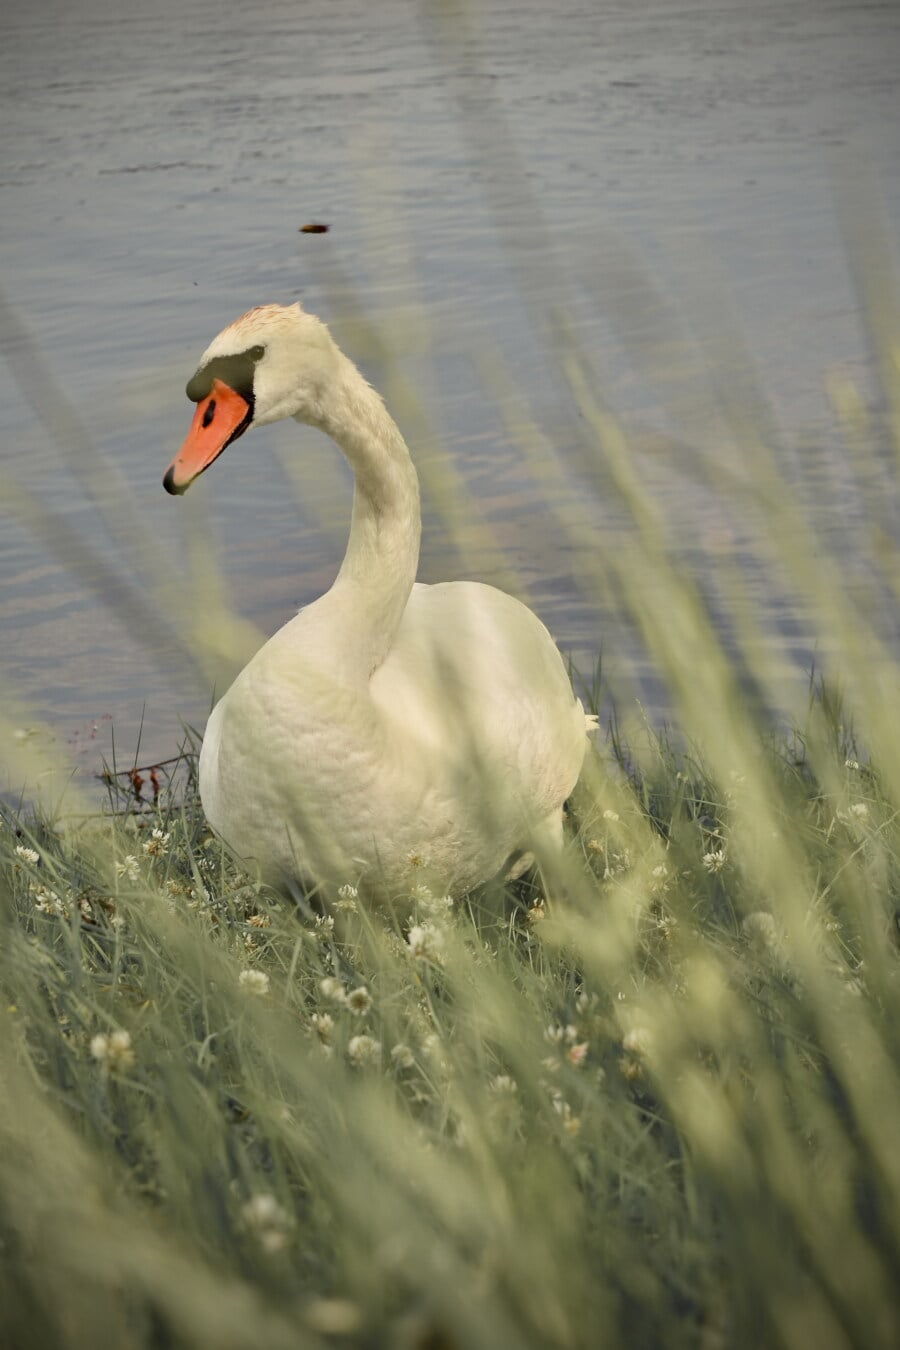 swan, grazing, grass, riverbank, feather, aquatic bird, wildlife, lake, bird, beak